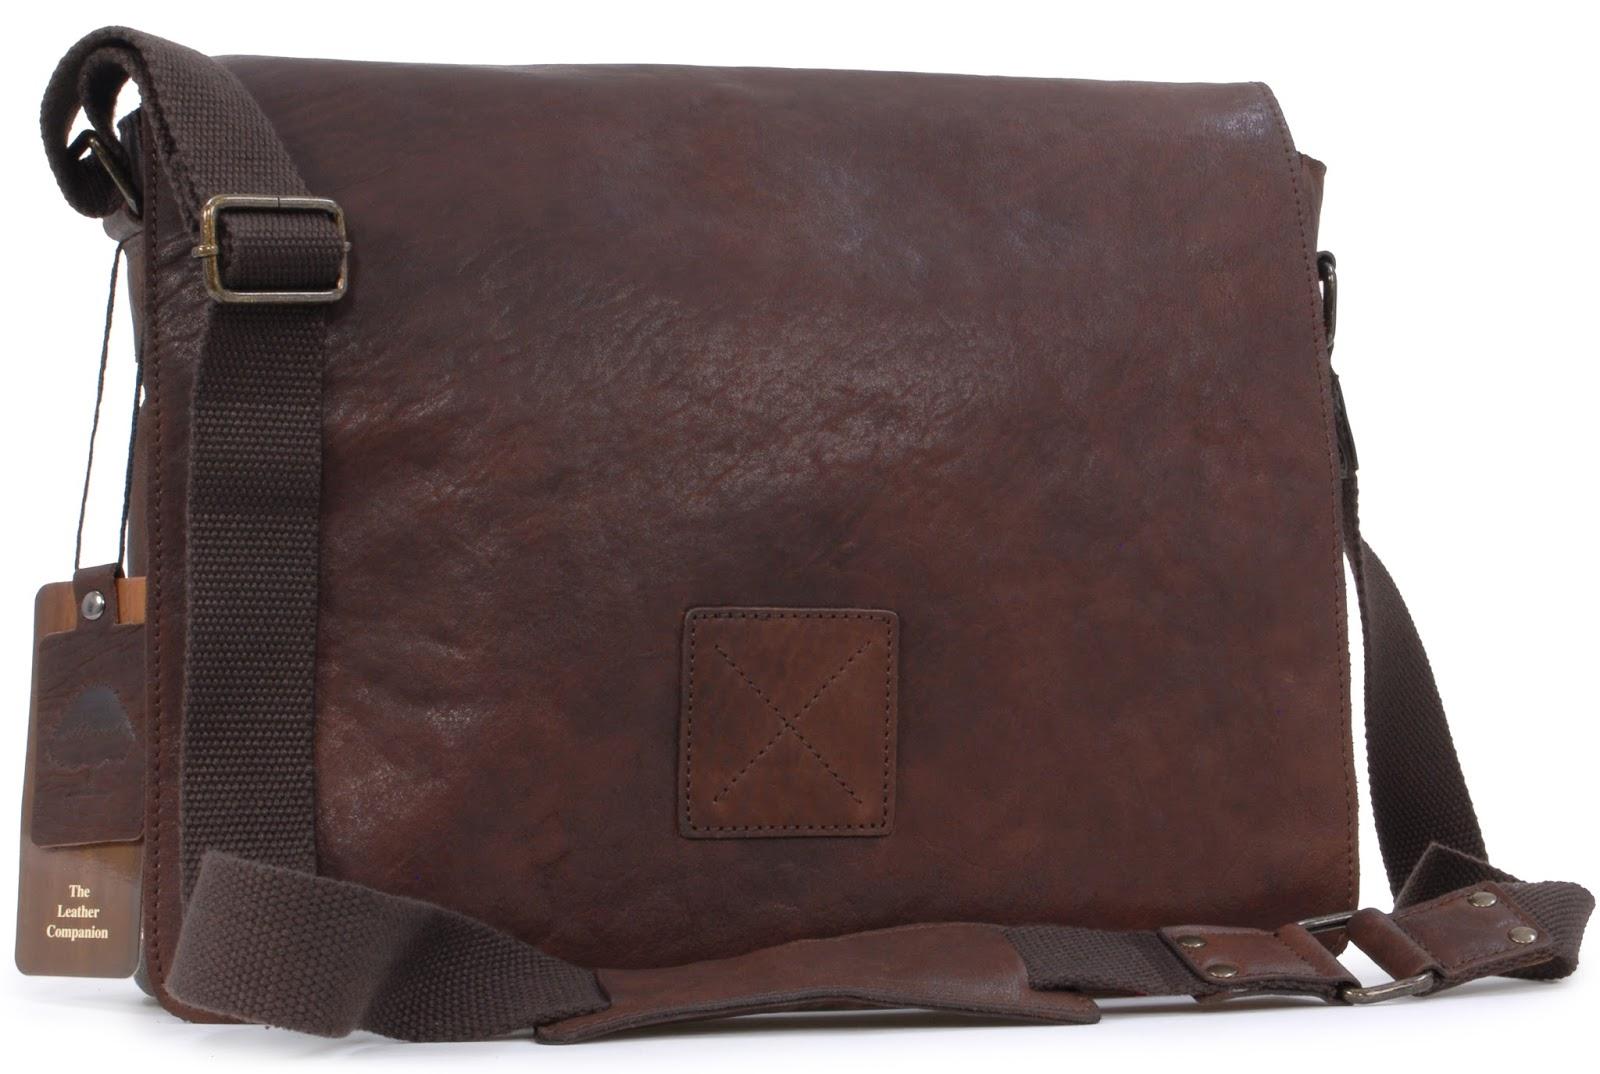 The Real Handbag Shop Blog: Amazing New Leather Messenger Bag for ...